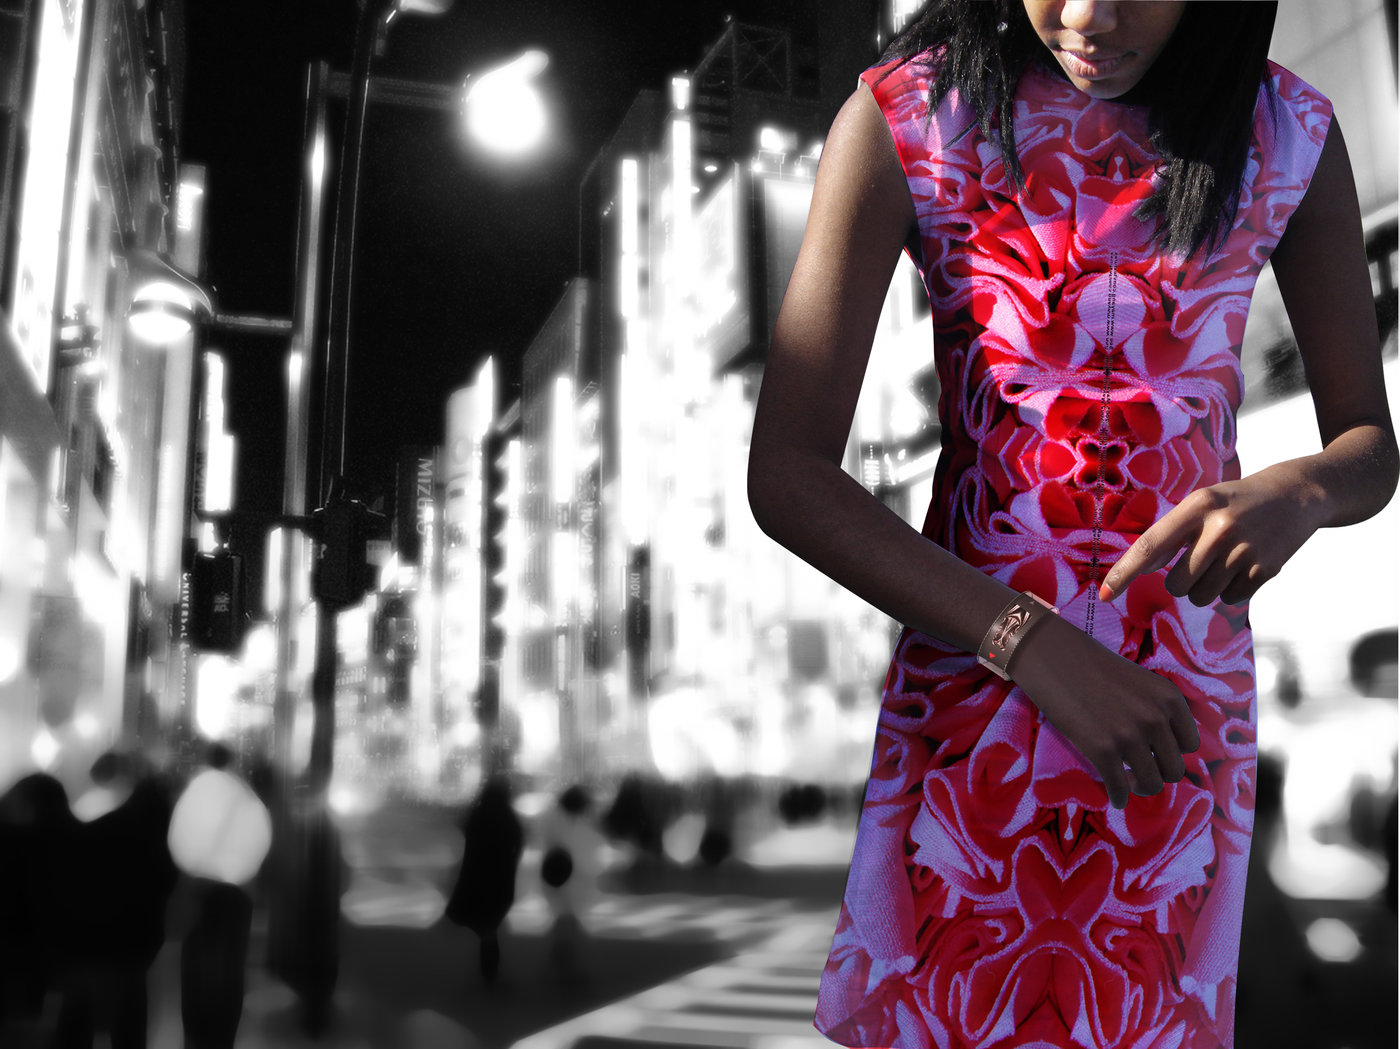 Pattern Changing Clothing by yong hwan Kwon at Coroflot com